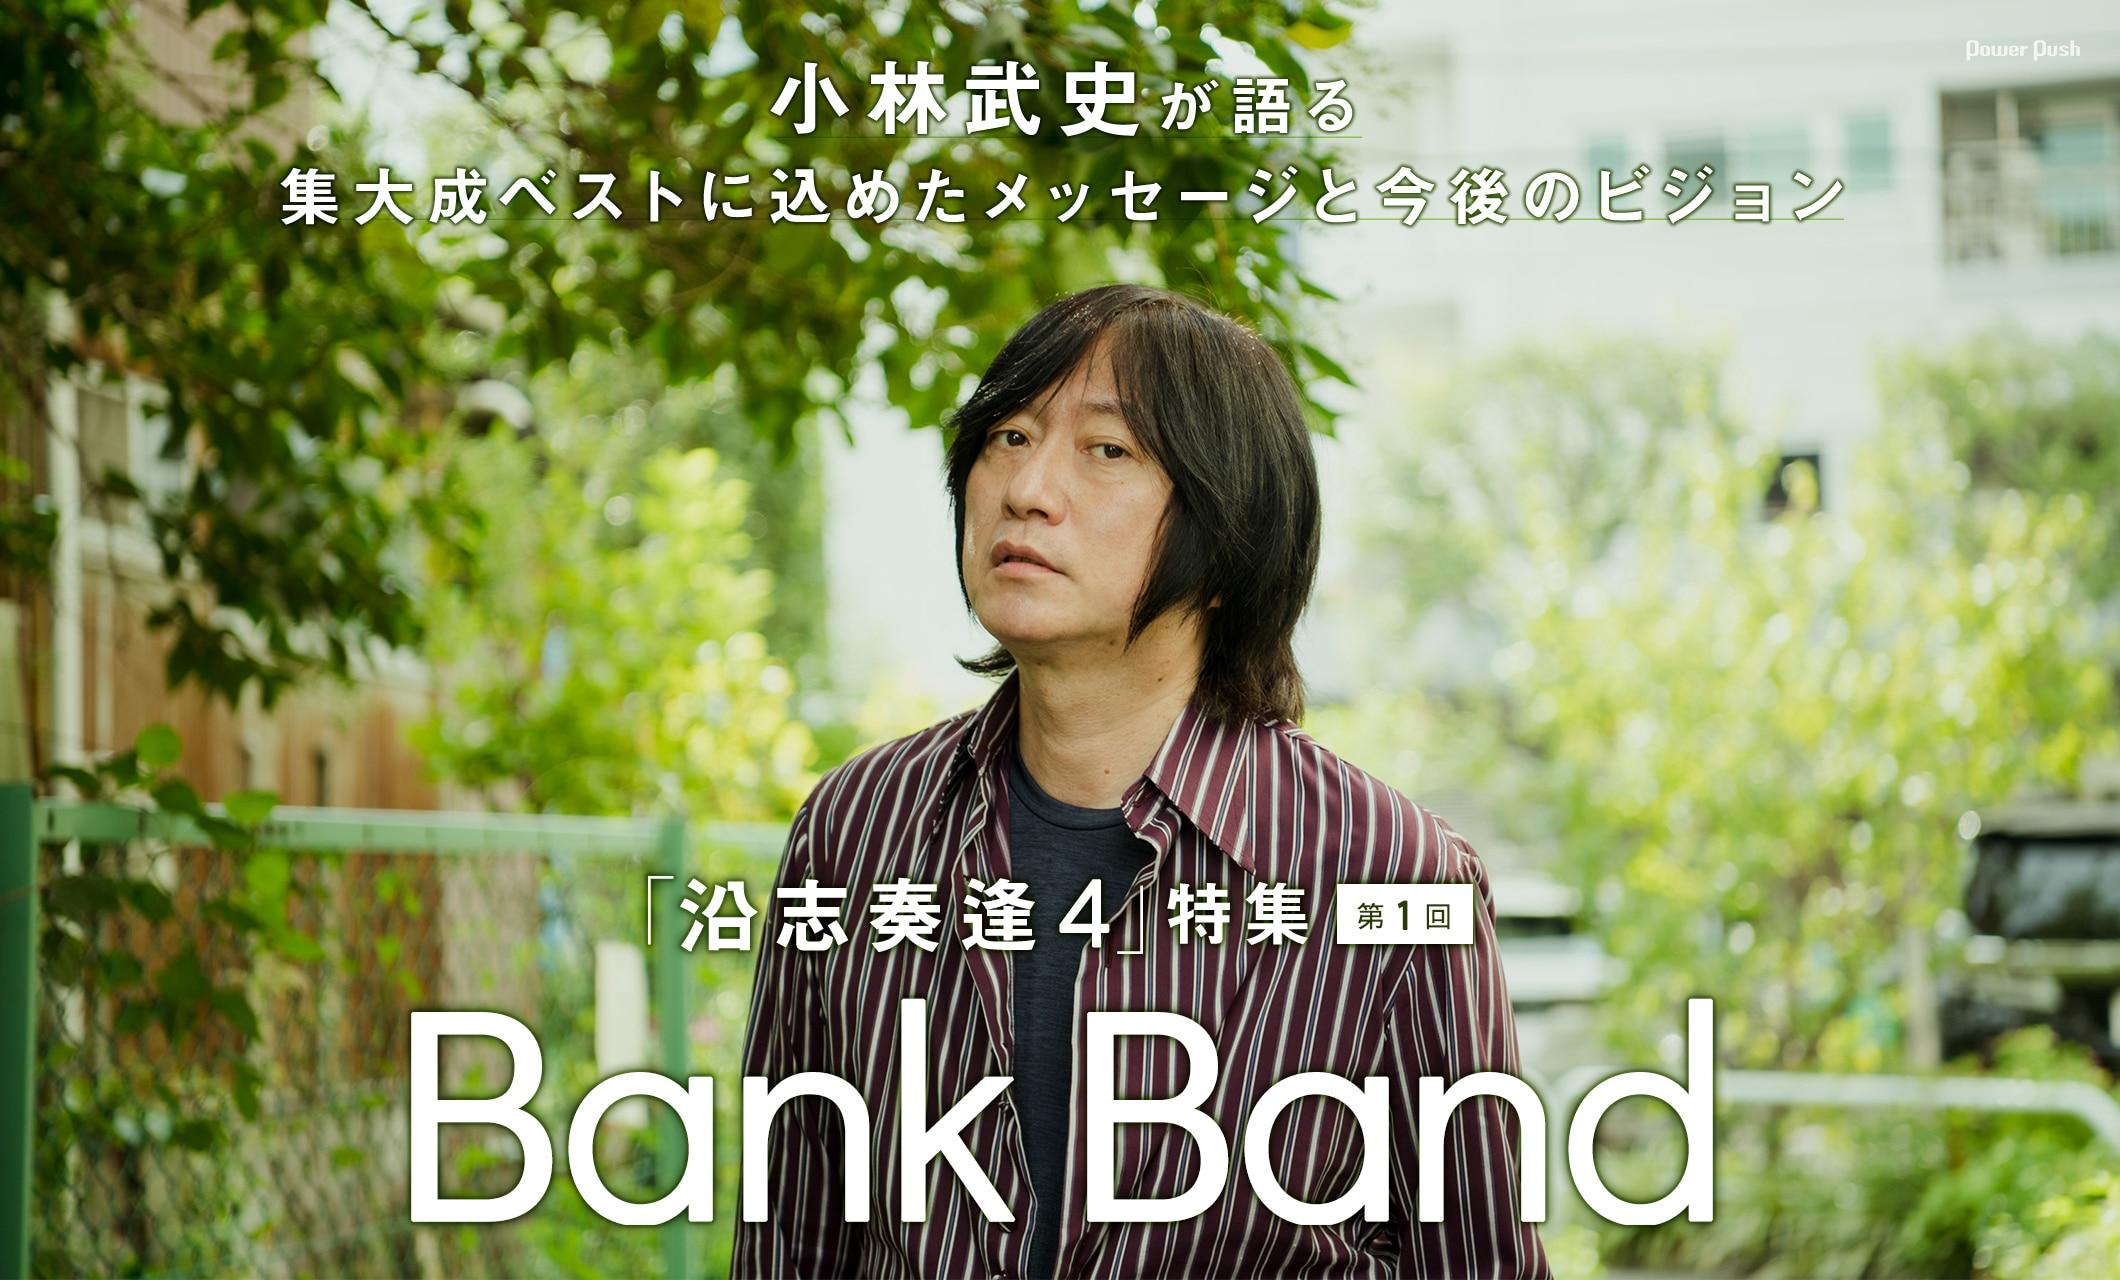 Bank Band「沿志奏逢 4」特集第1回 小林武史が語る集大成ベストに込めたメッセージと今後のビジョン